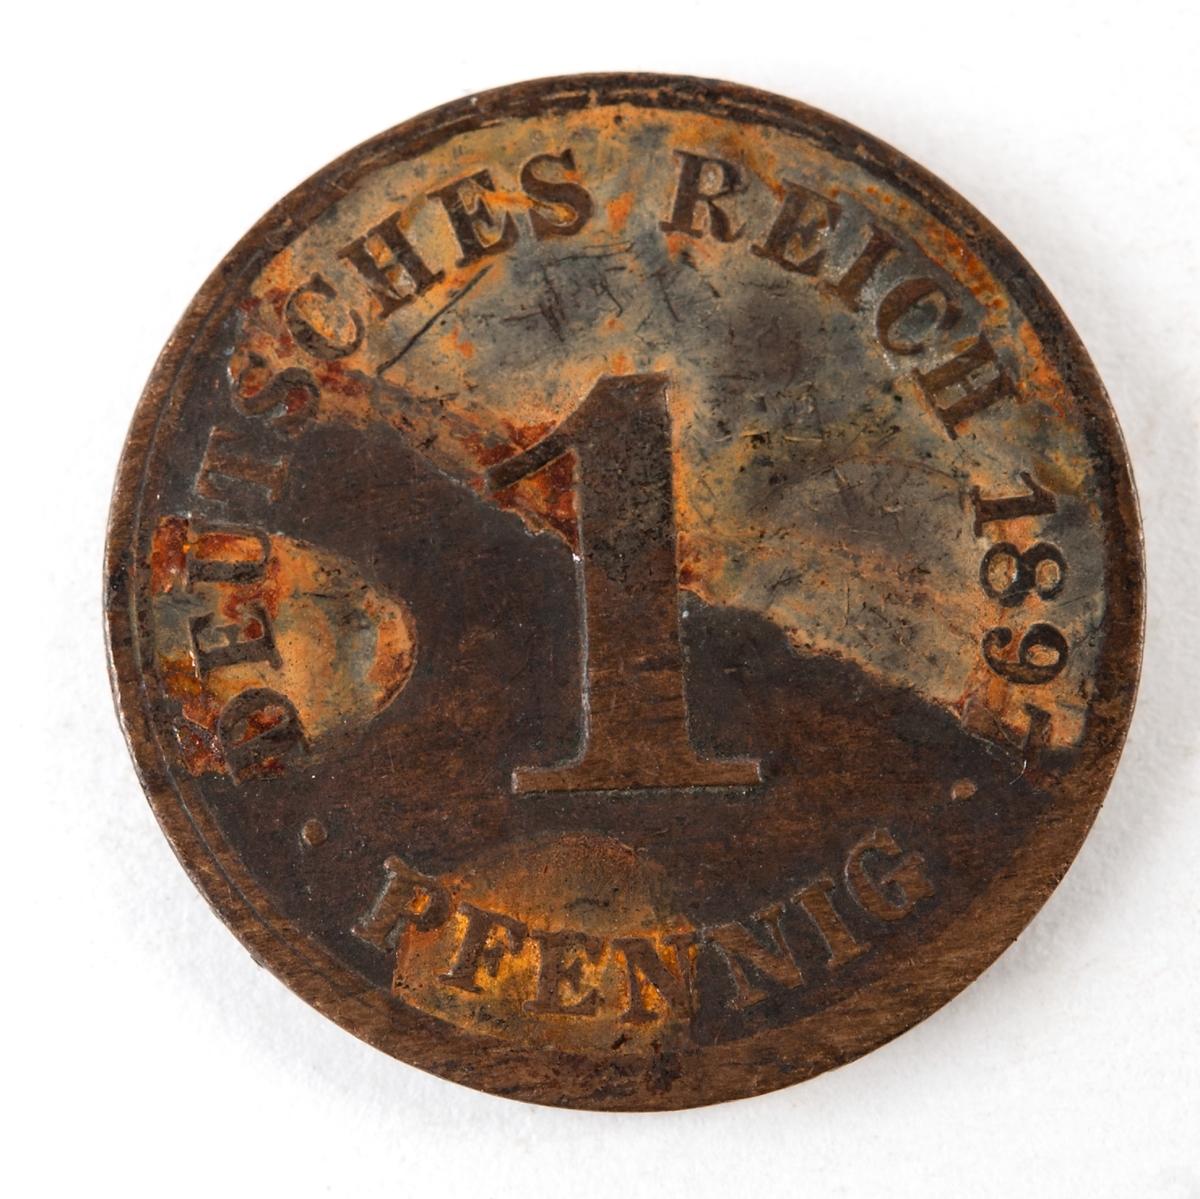 Tyskt 1-pfennigmynt präglat 1897